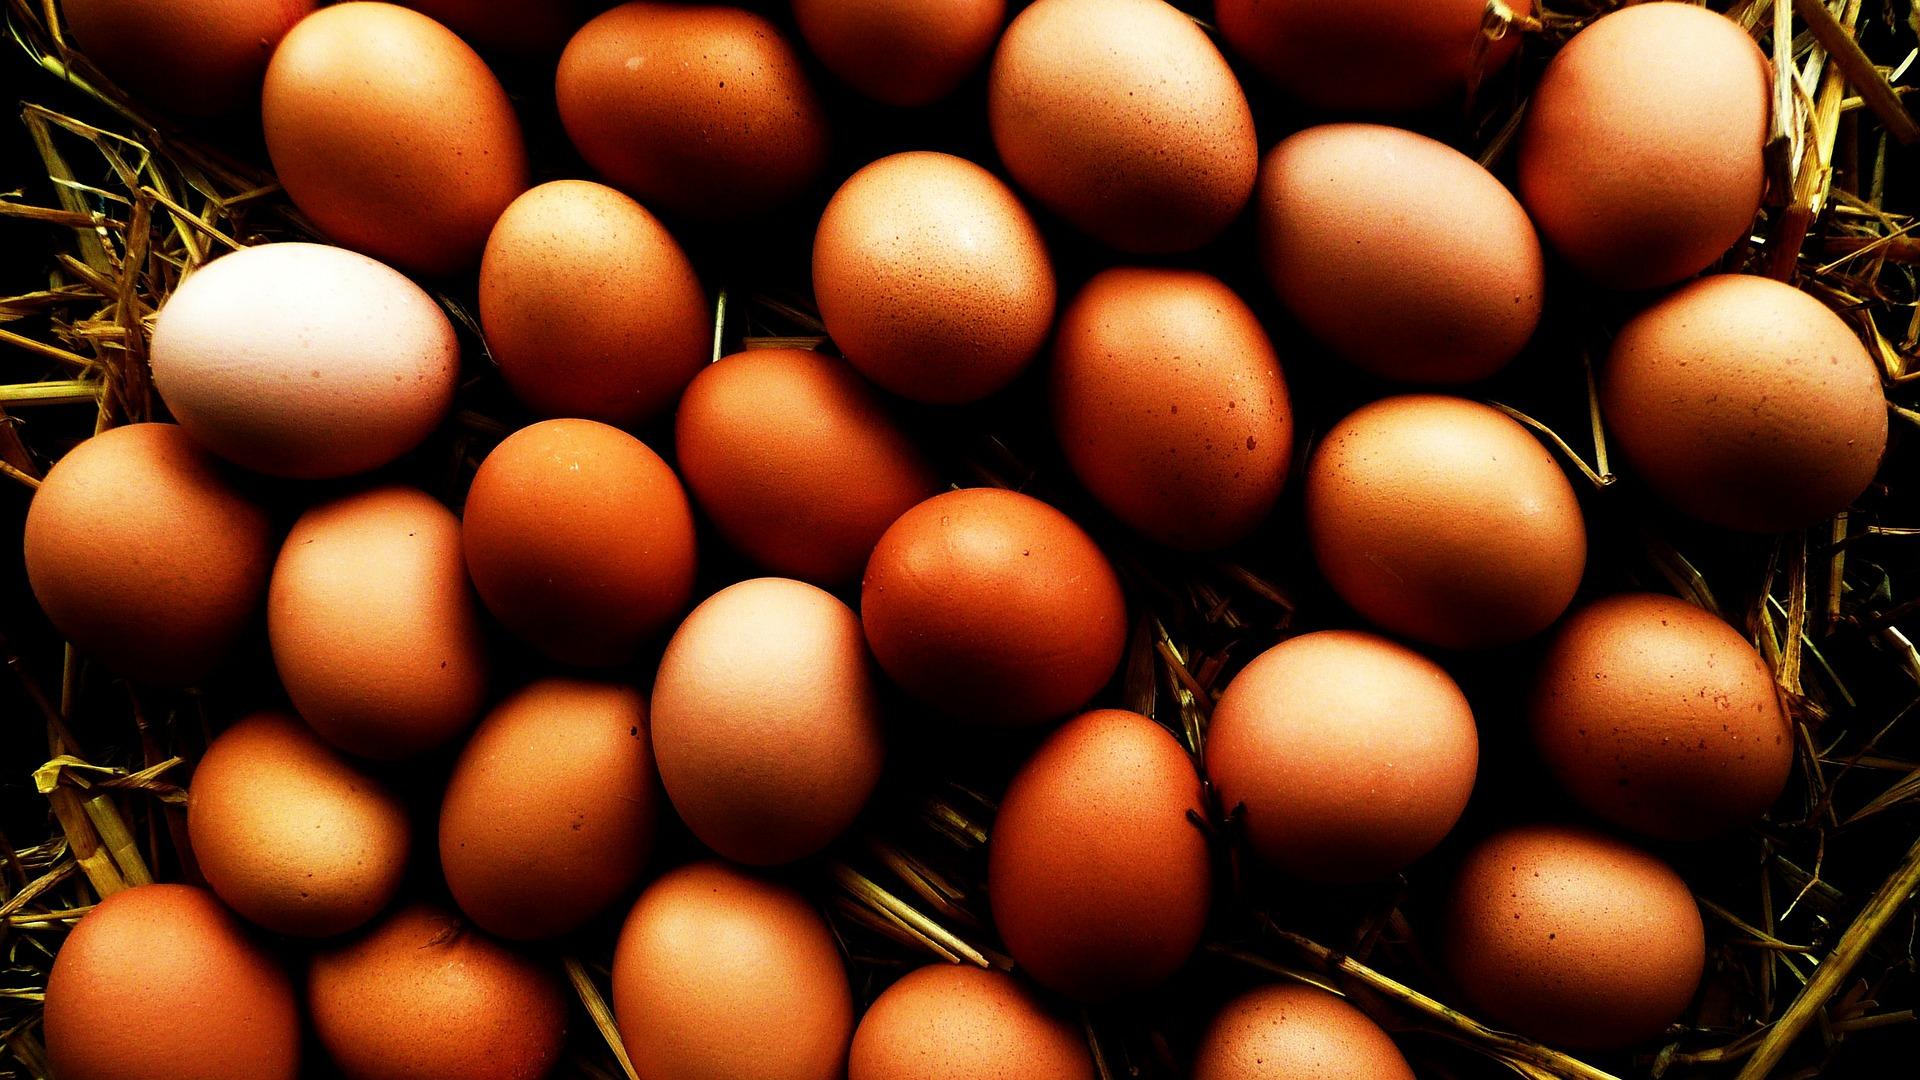 Beautiful home-grown eggs - aren'tchooks brilliant?